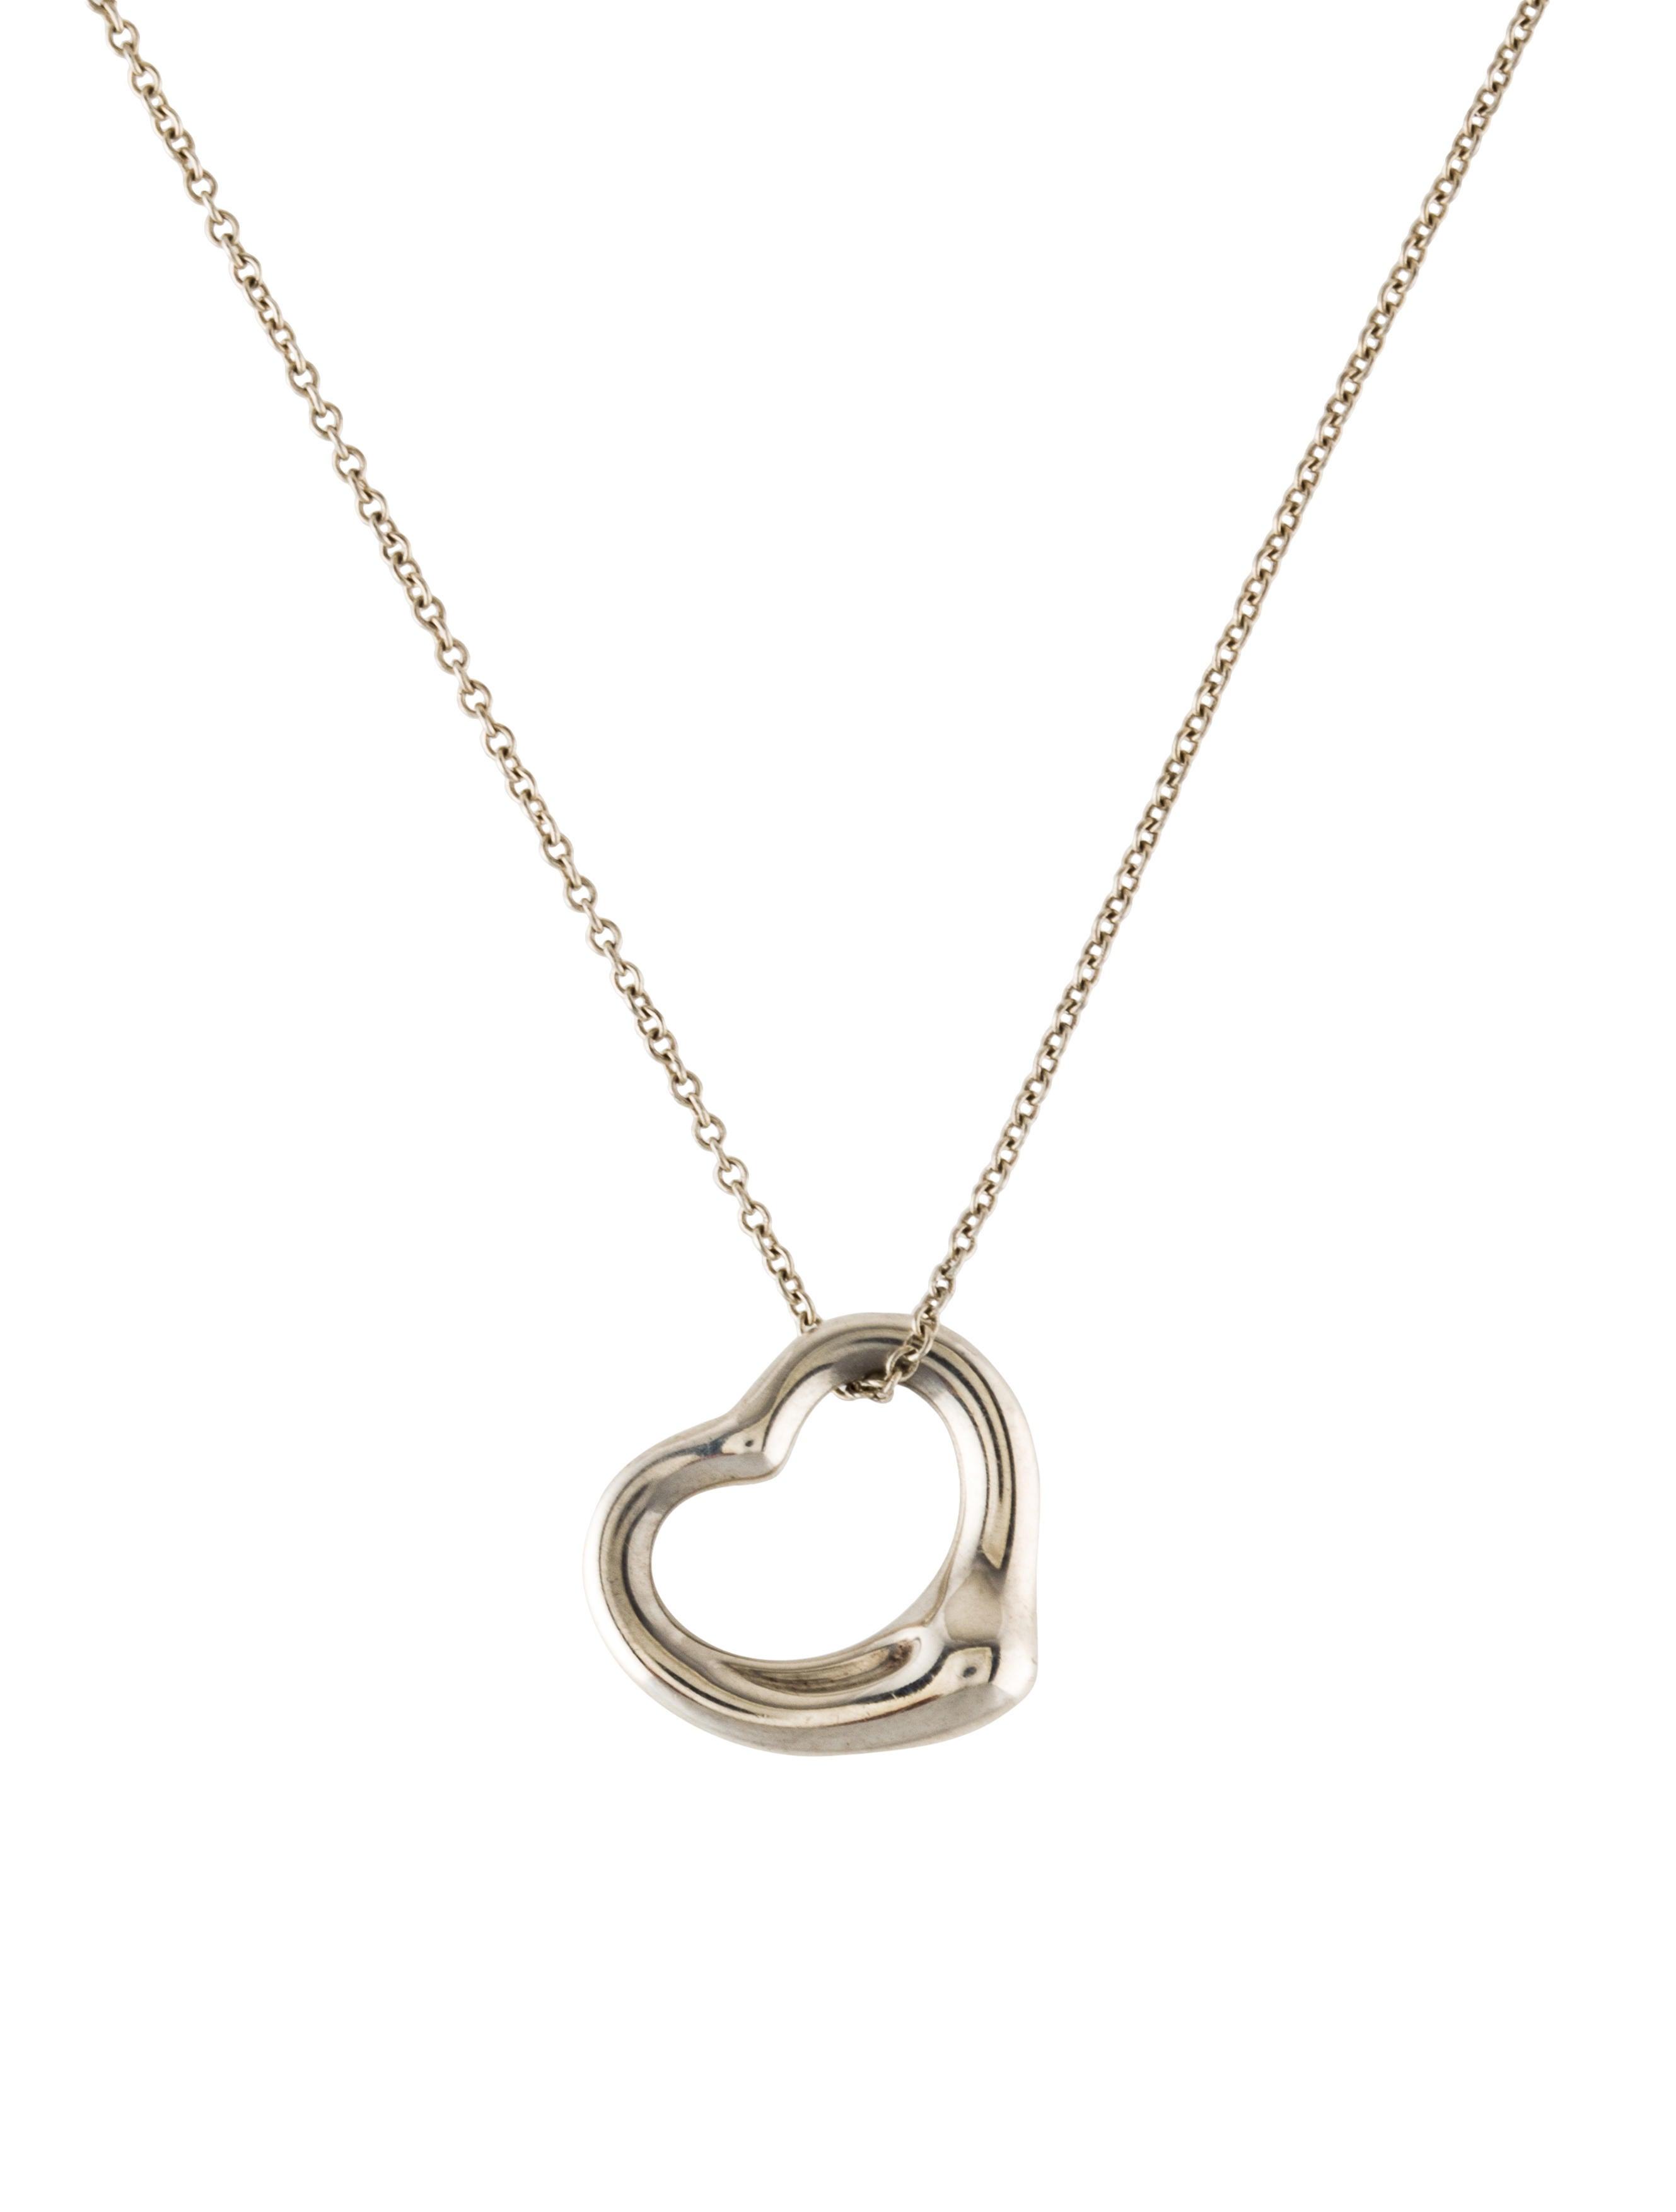 Tiffany co open heart pendant necklace necklaces tif65399 open heart pendant necklace aloadofball Gallery